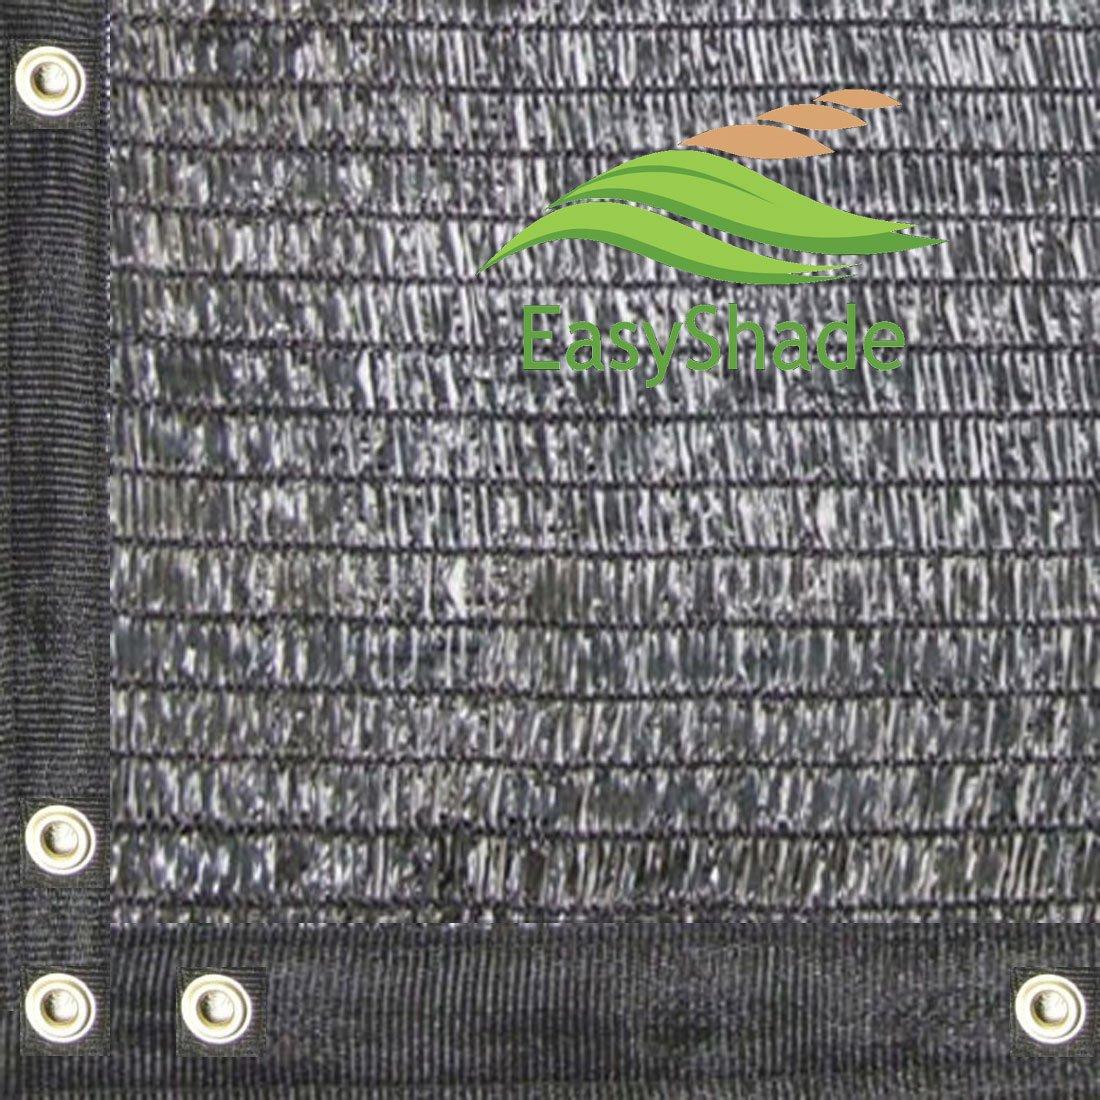 Easyshade 30% UV Shade Cloth Black Premium Mesh Shadecloth Sunblock Shade Panel 20ft x 36ft Top Quality